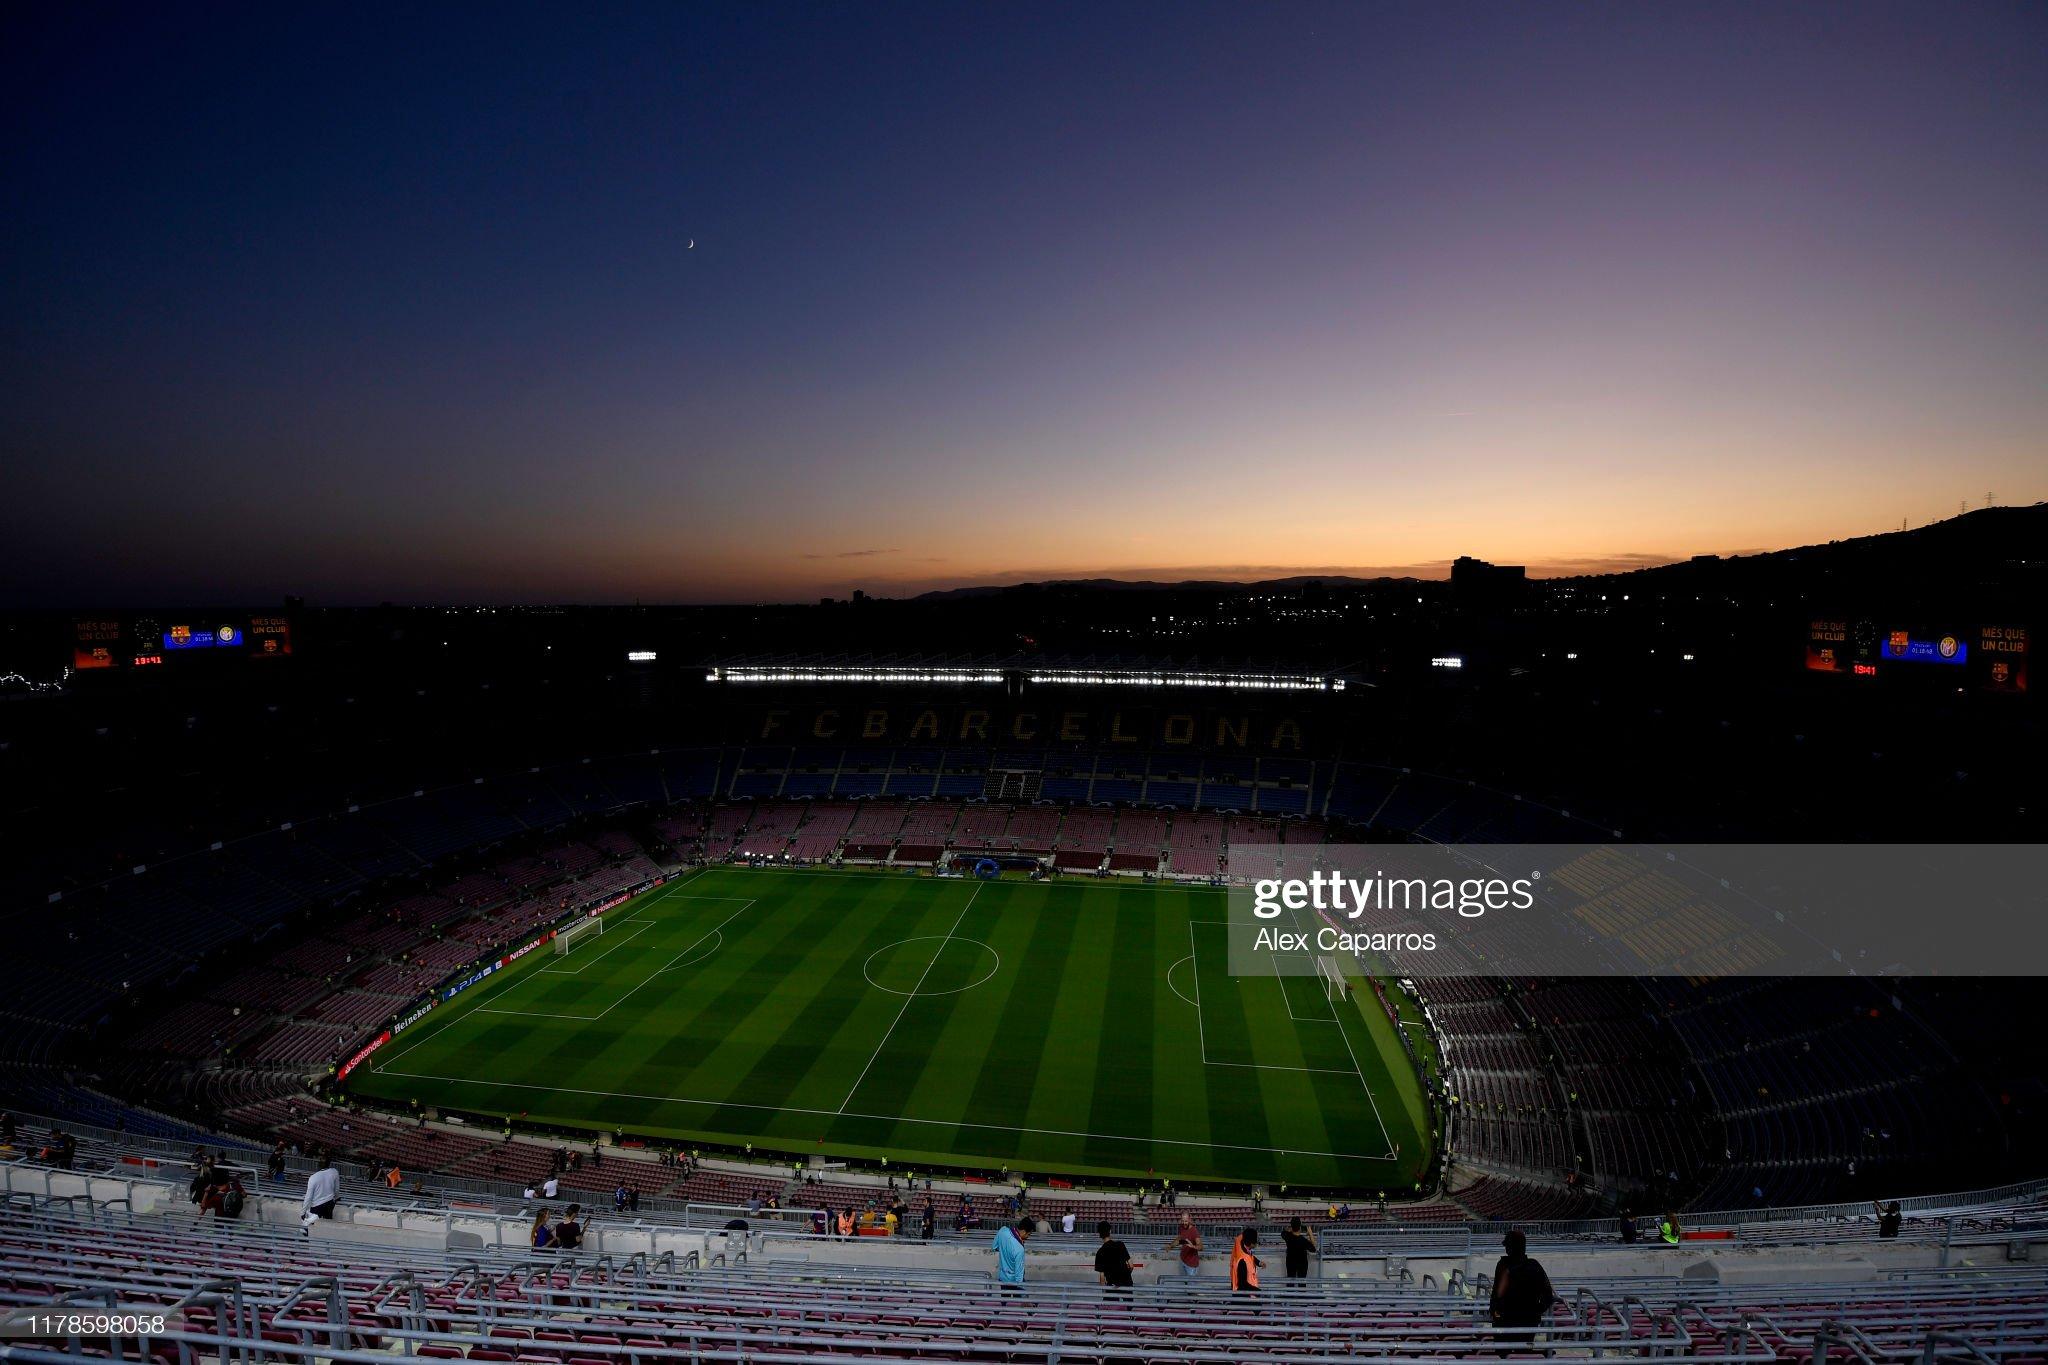 صور مباراة : برشلونة - إنتر 2-1 ( 02-10-2019 )  General-view-inside-the-stadium-prior-to-the-uefa-champions-league-f-picture-id1178598058?s=2048x2048